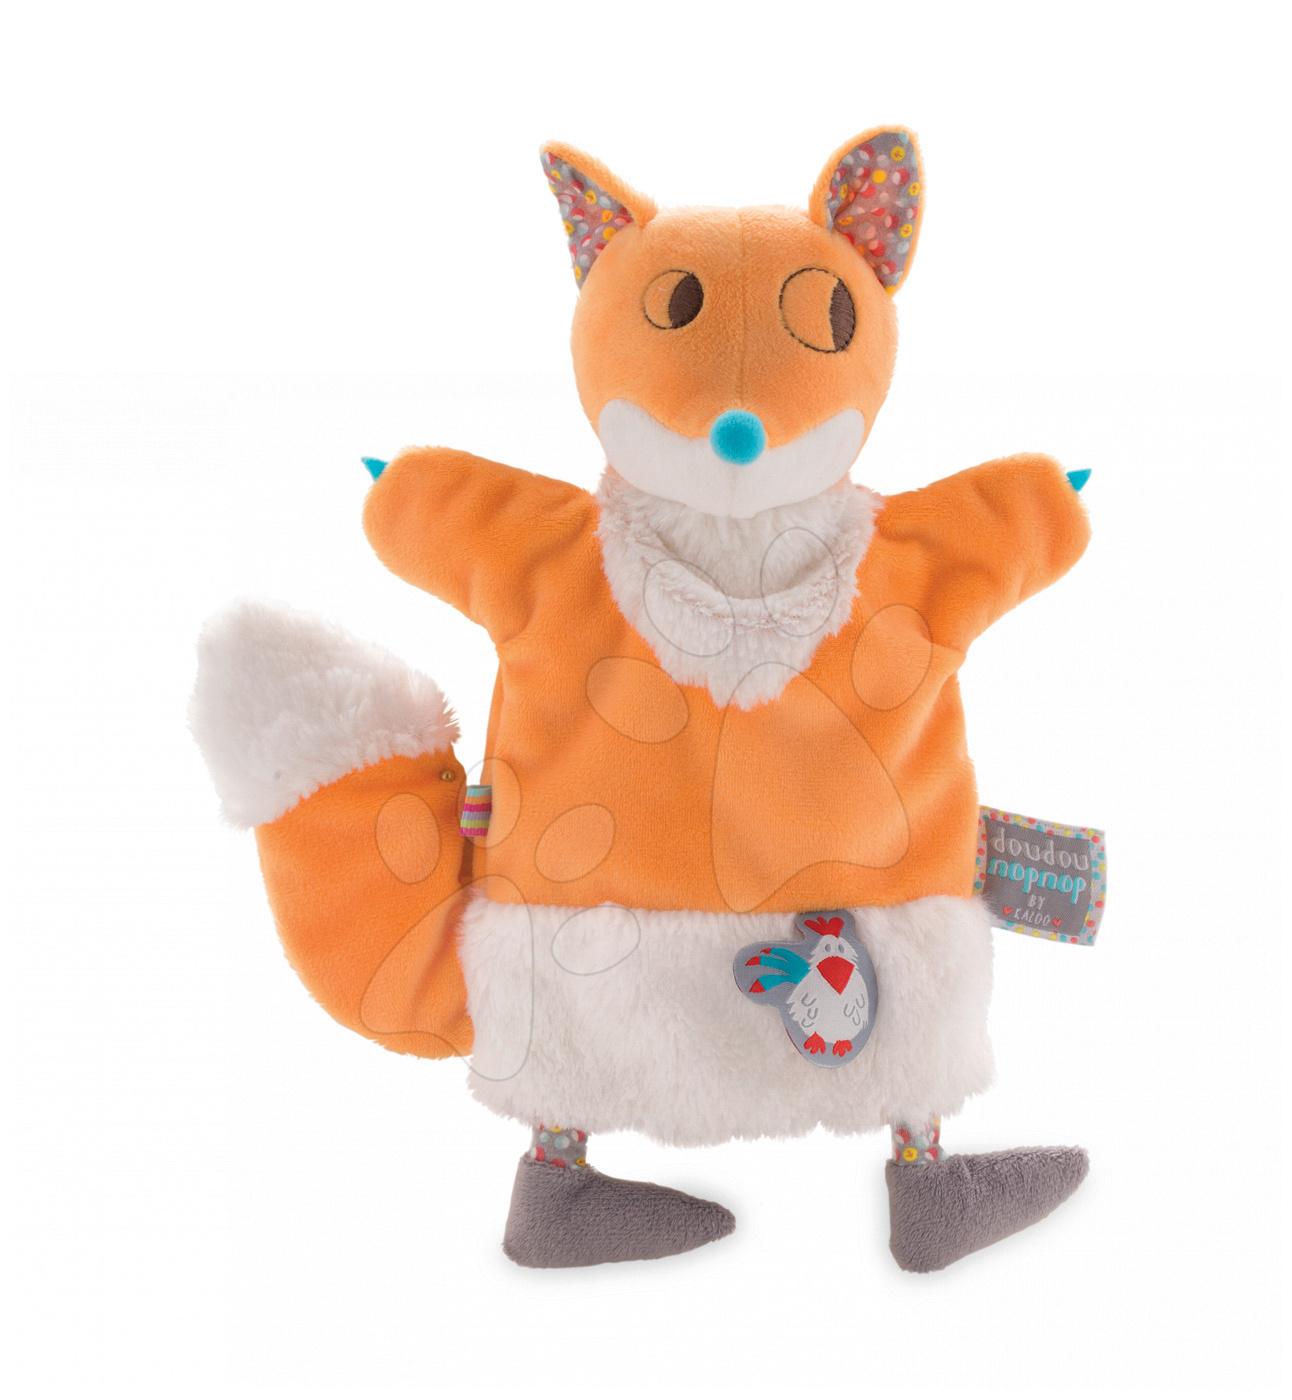 Plyšová liška loutkové divadlo Kaloo Nop Nop-Yummy Fox Doudou 25 cm